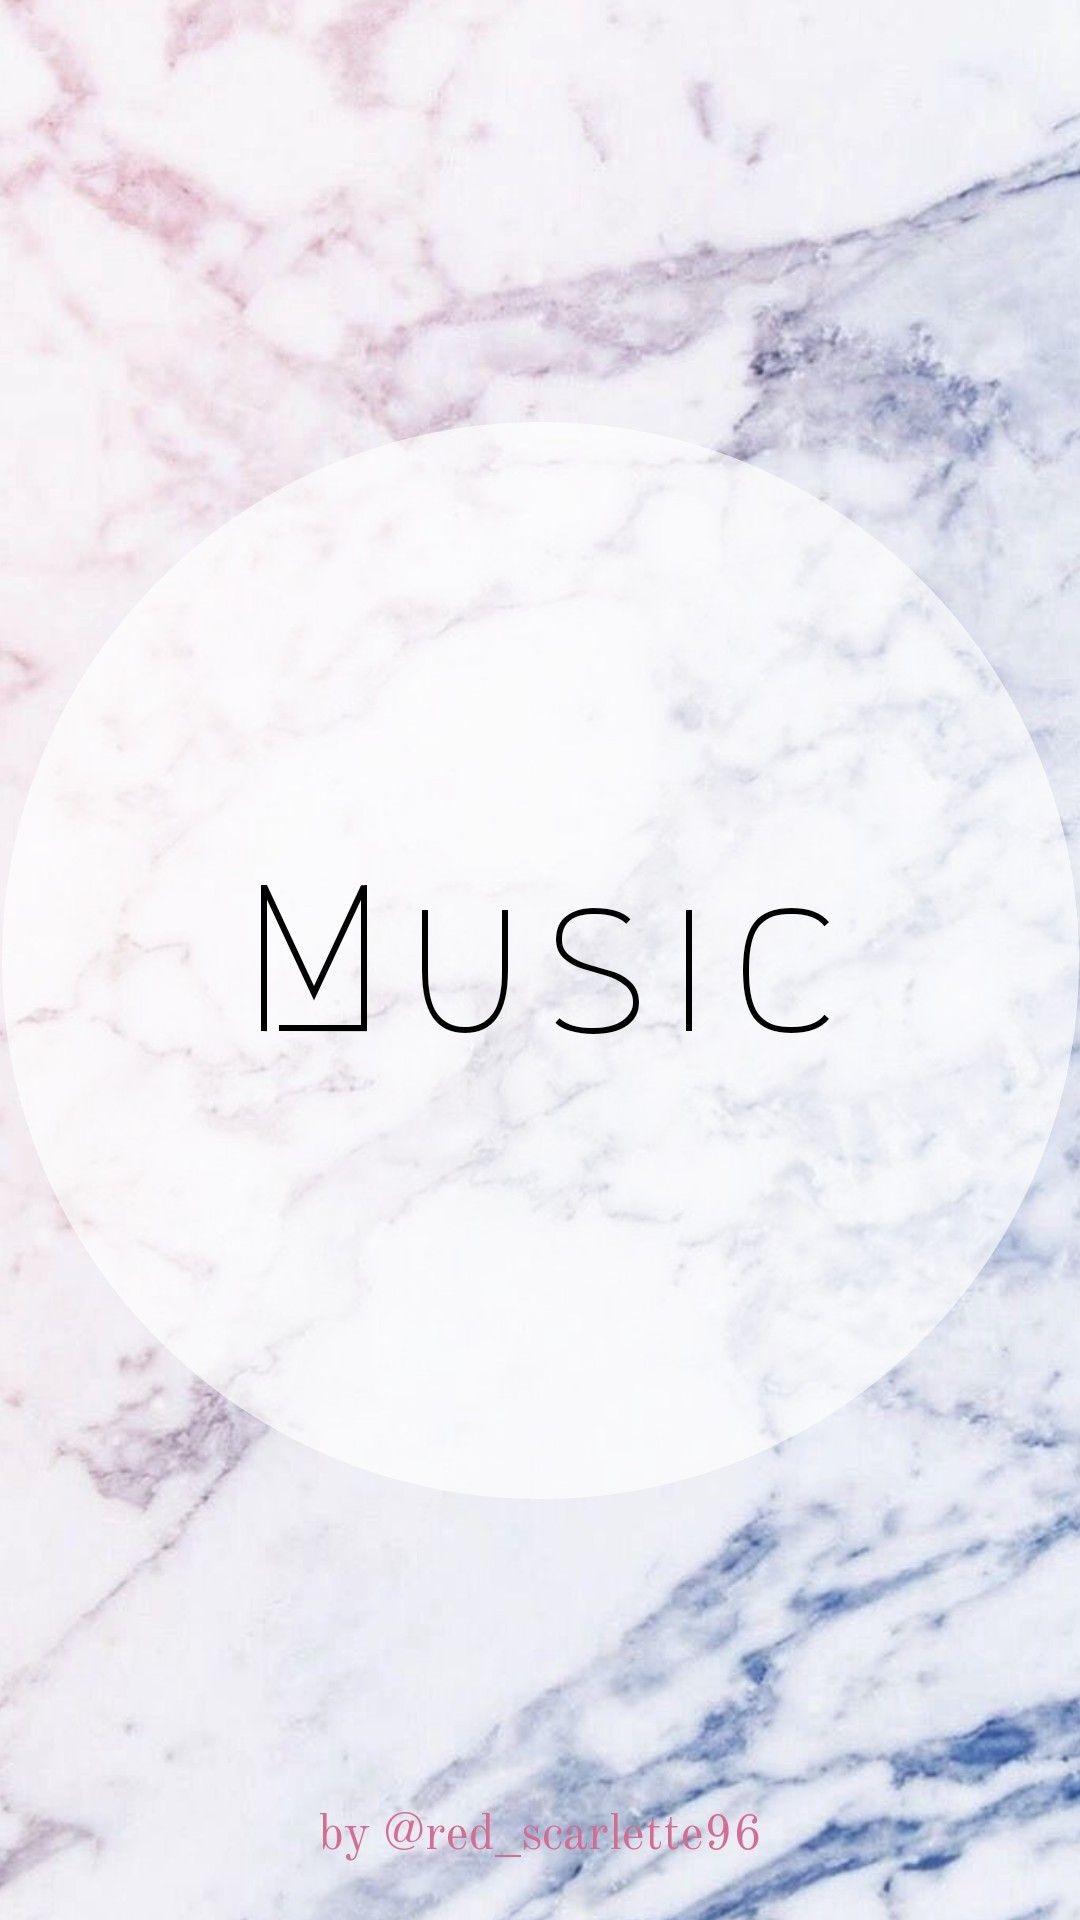 Calendario 2017 Listo Para Imprimir Recientes Instagram Highlight Icon Template Marble Gra Nt Music Template Of Calendario 2017 Listo Para Imprimir Más Actual Suzeth Castillo Suzeth Castillo En Pinterest